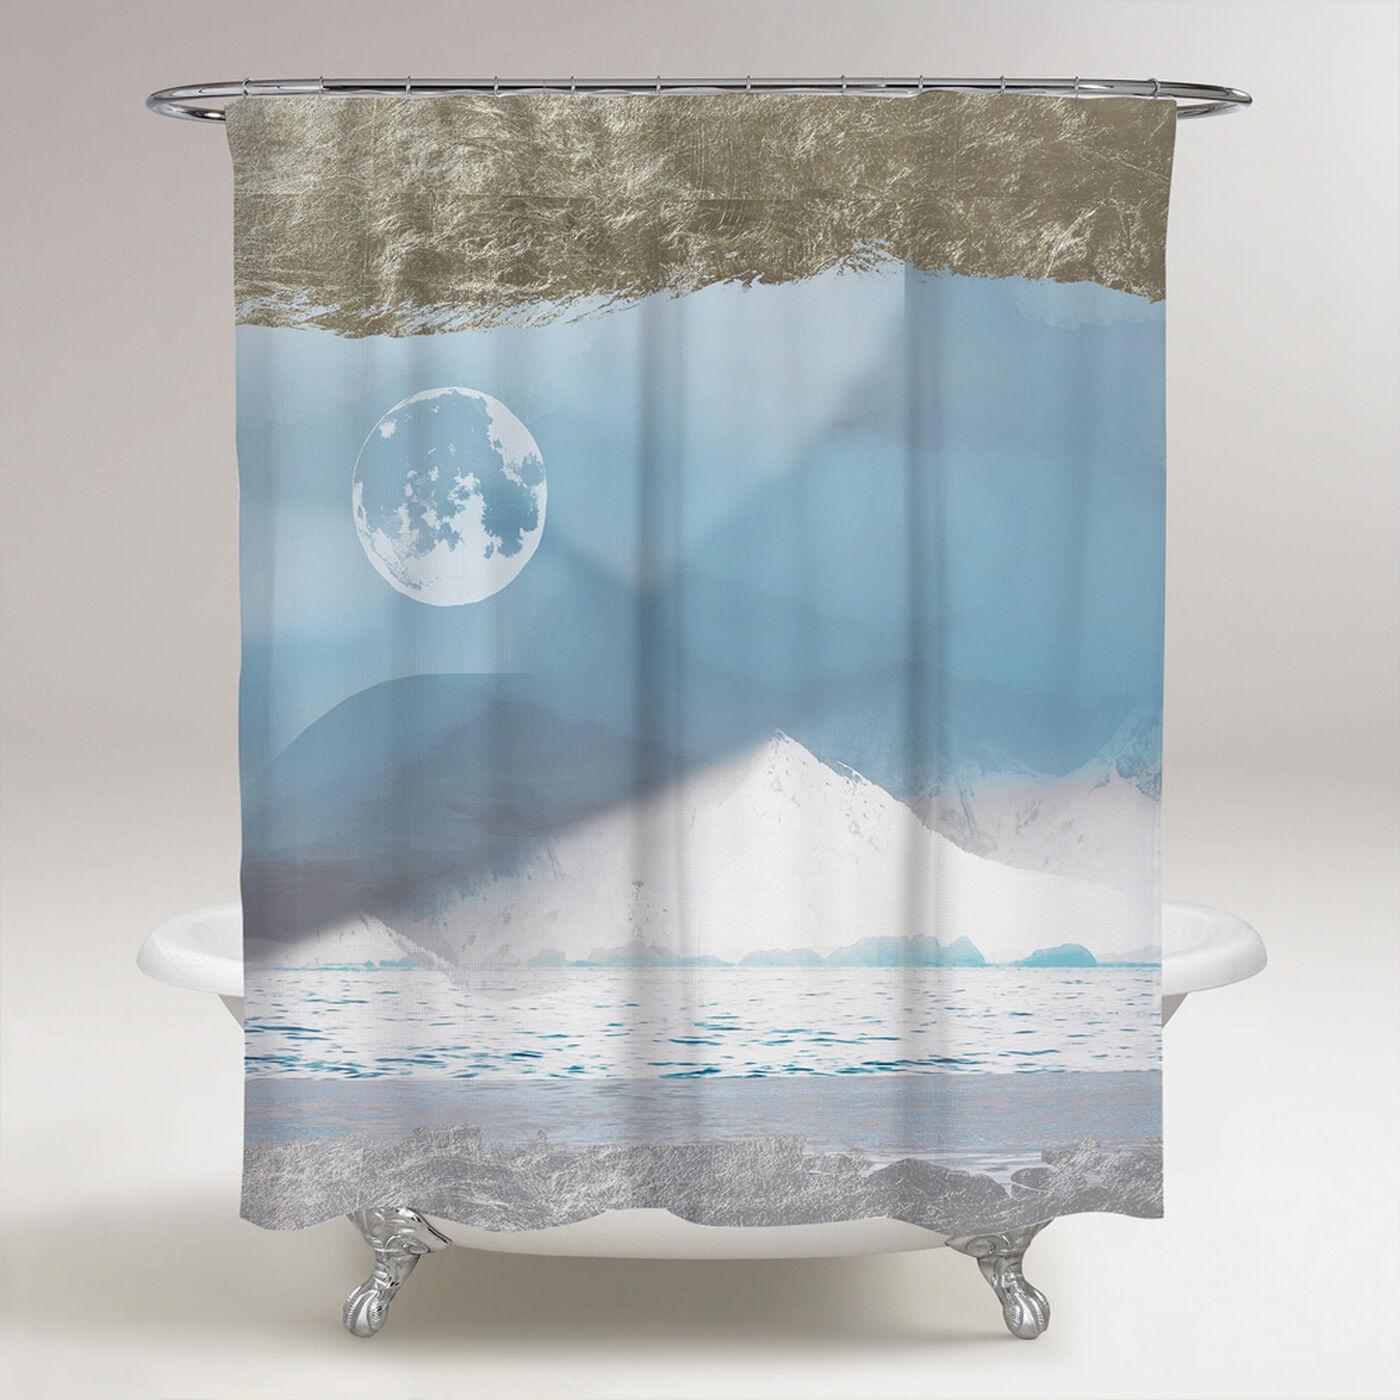 Viva La Luna Ethereal Shower Curtain